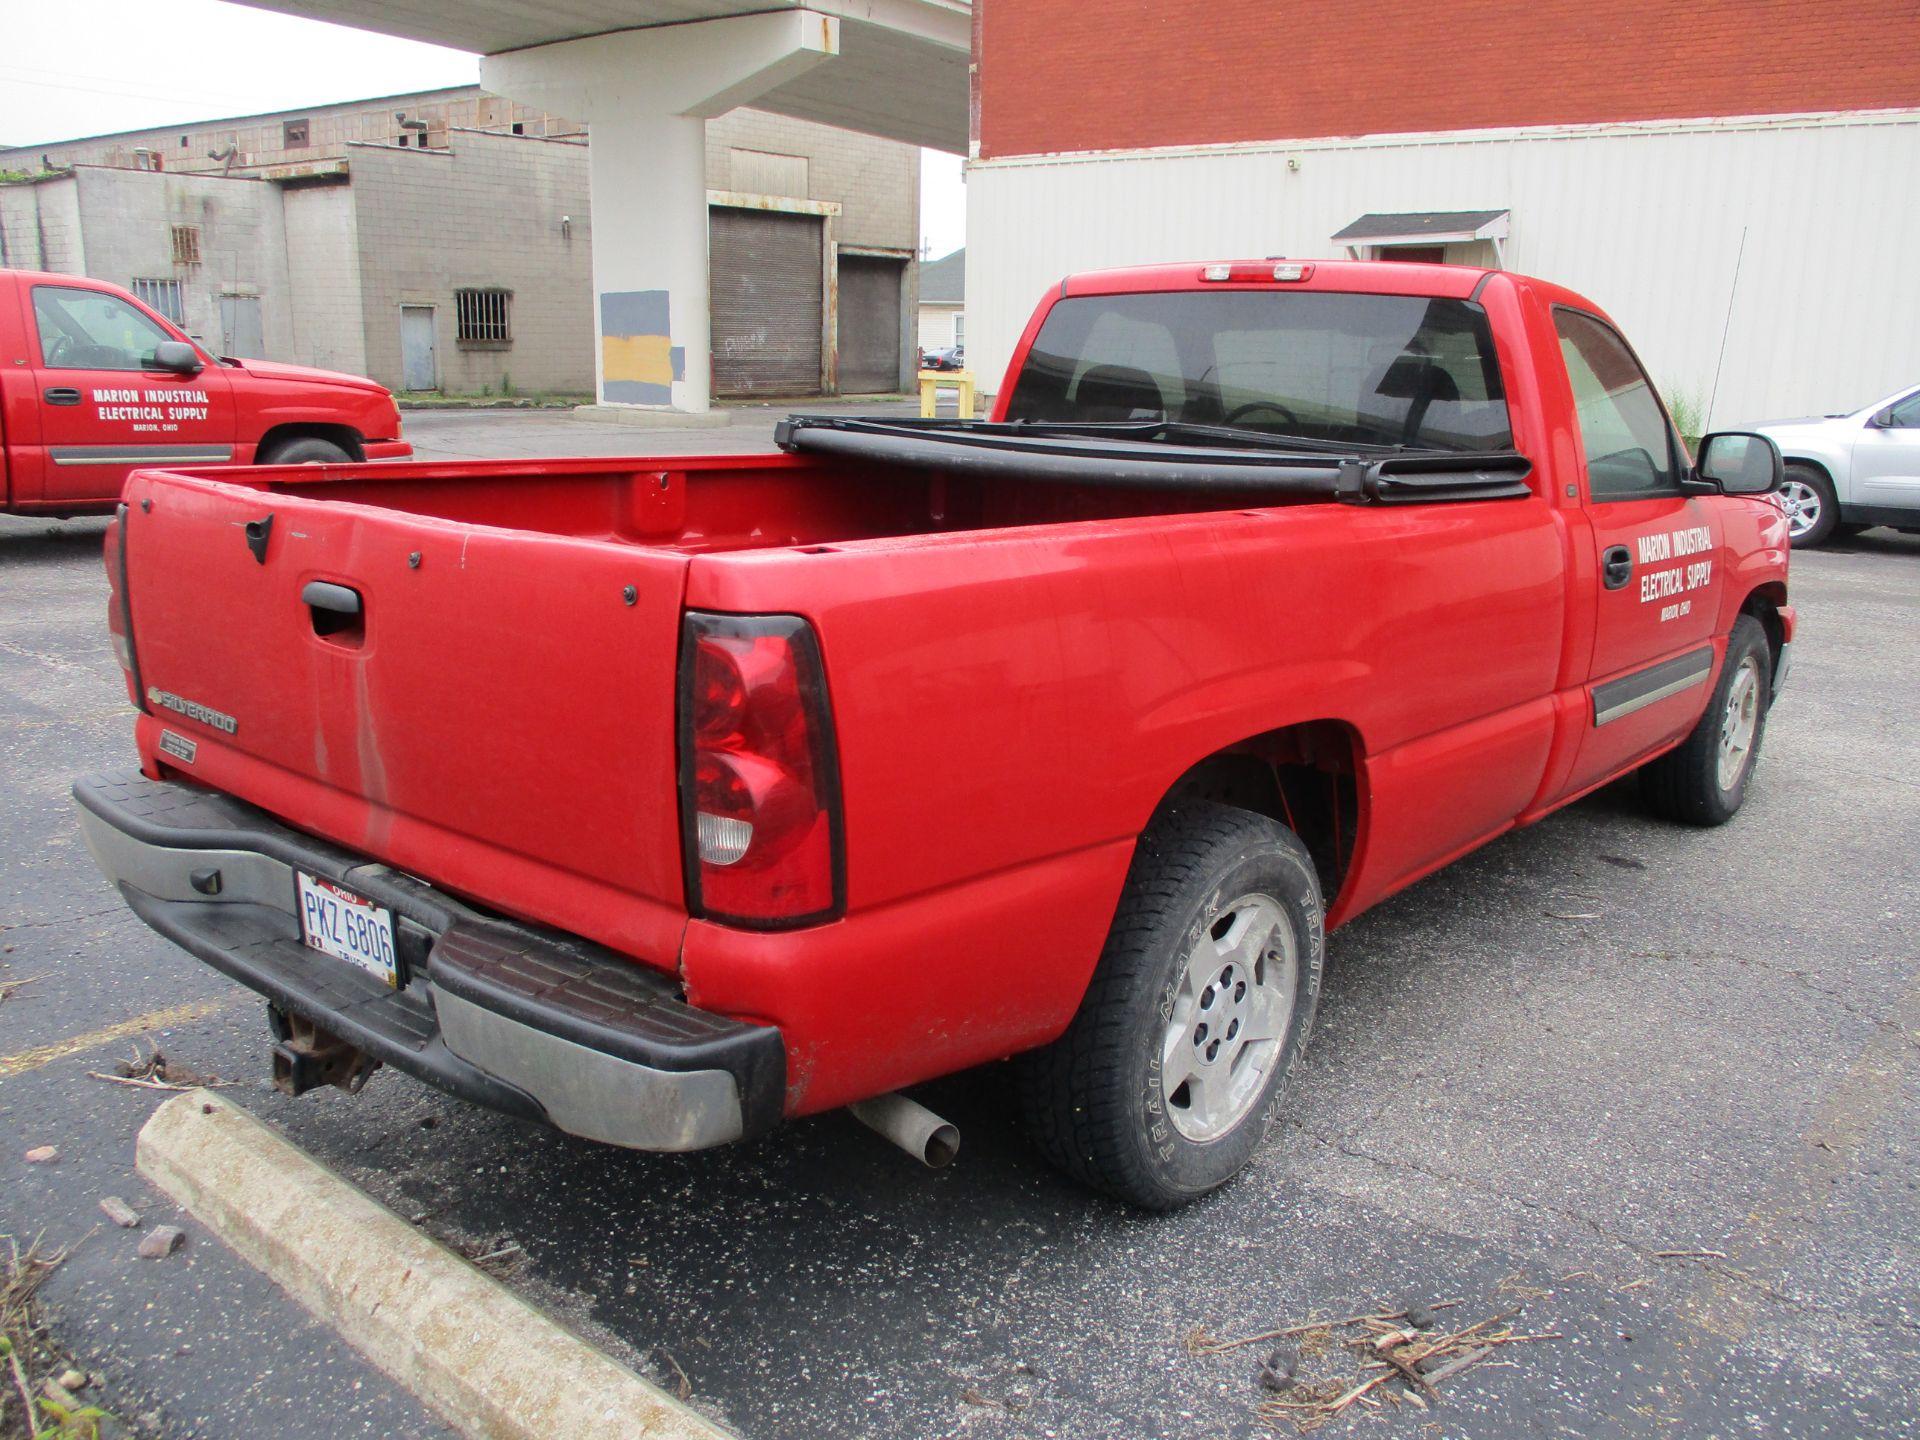 2006 Chevrolet Silverado 1500 LT Pickup, VIN 1GCEC14V96E251510, Regular Cab, Automatic, AC, 8' - Image 4 of 21